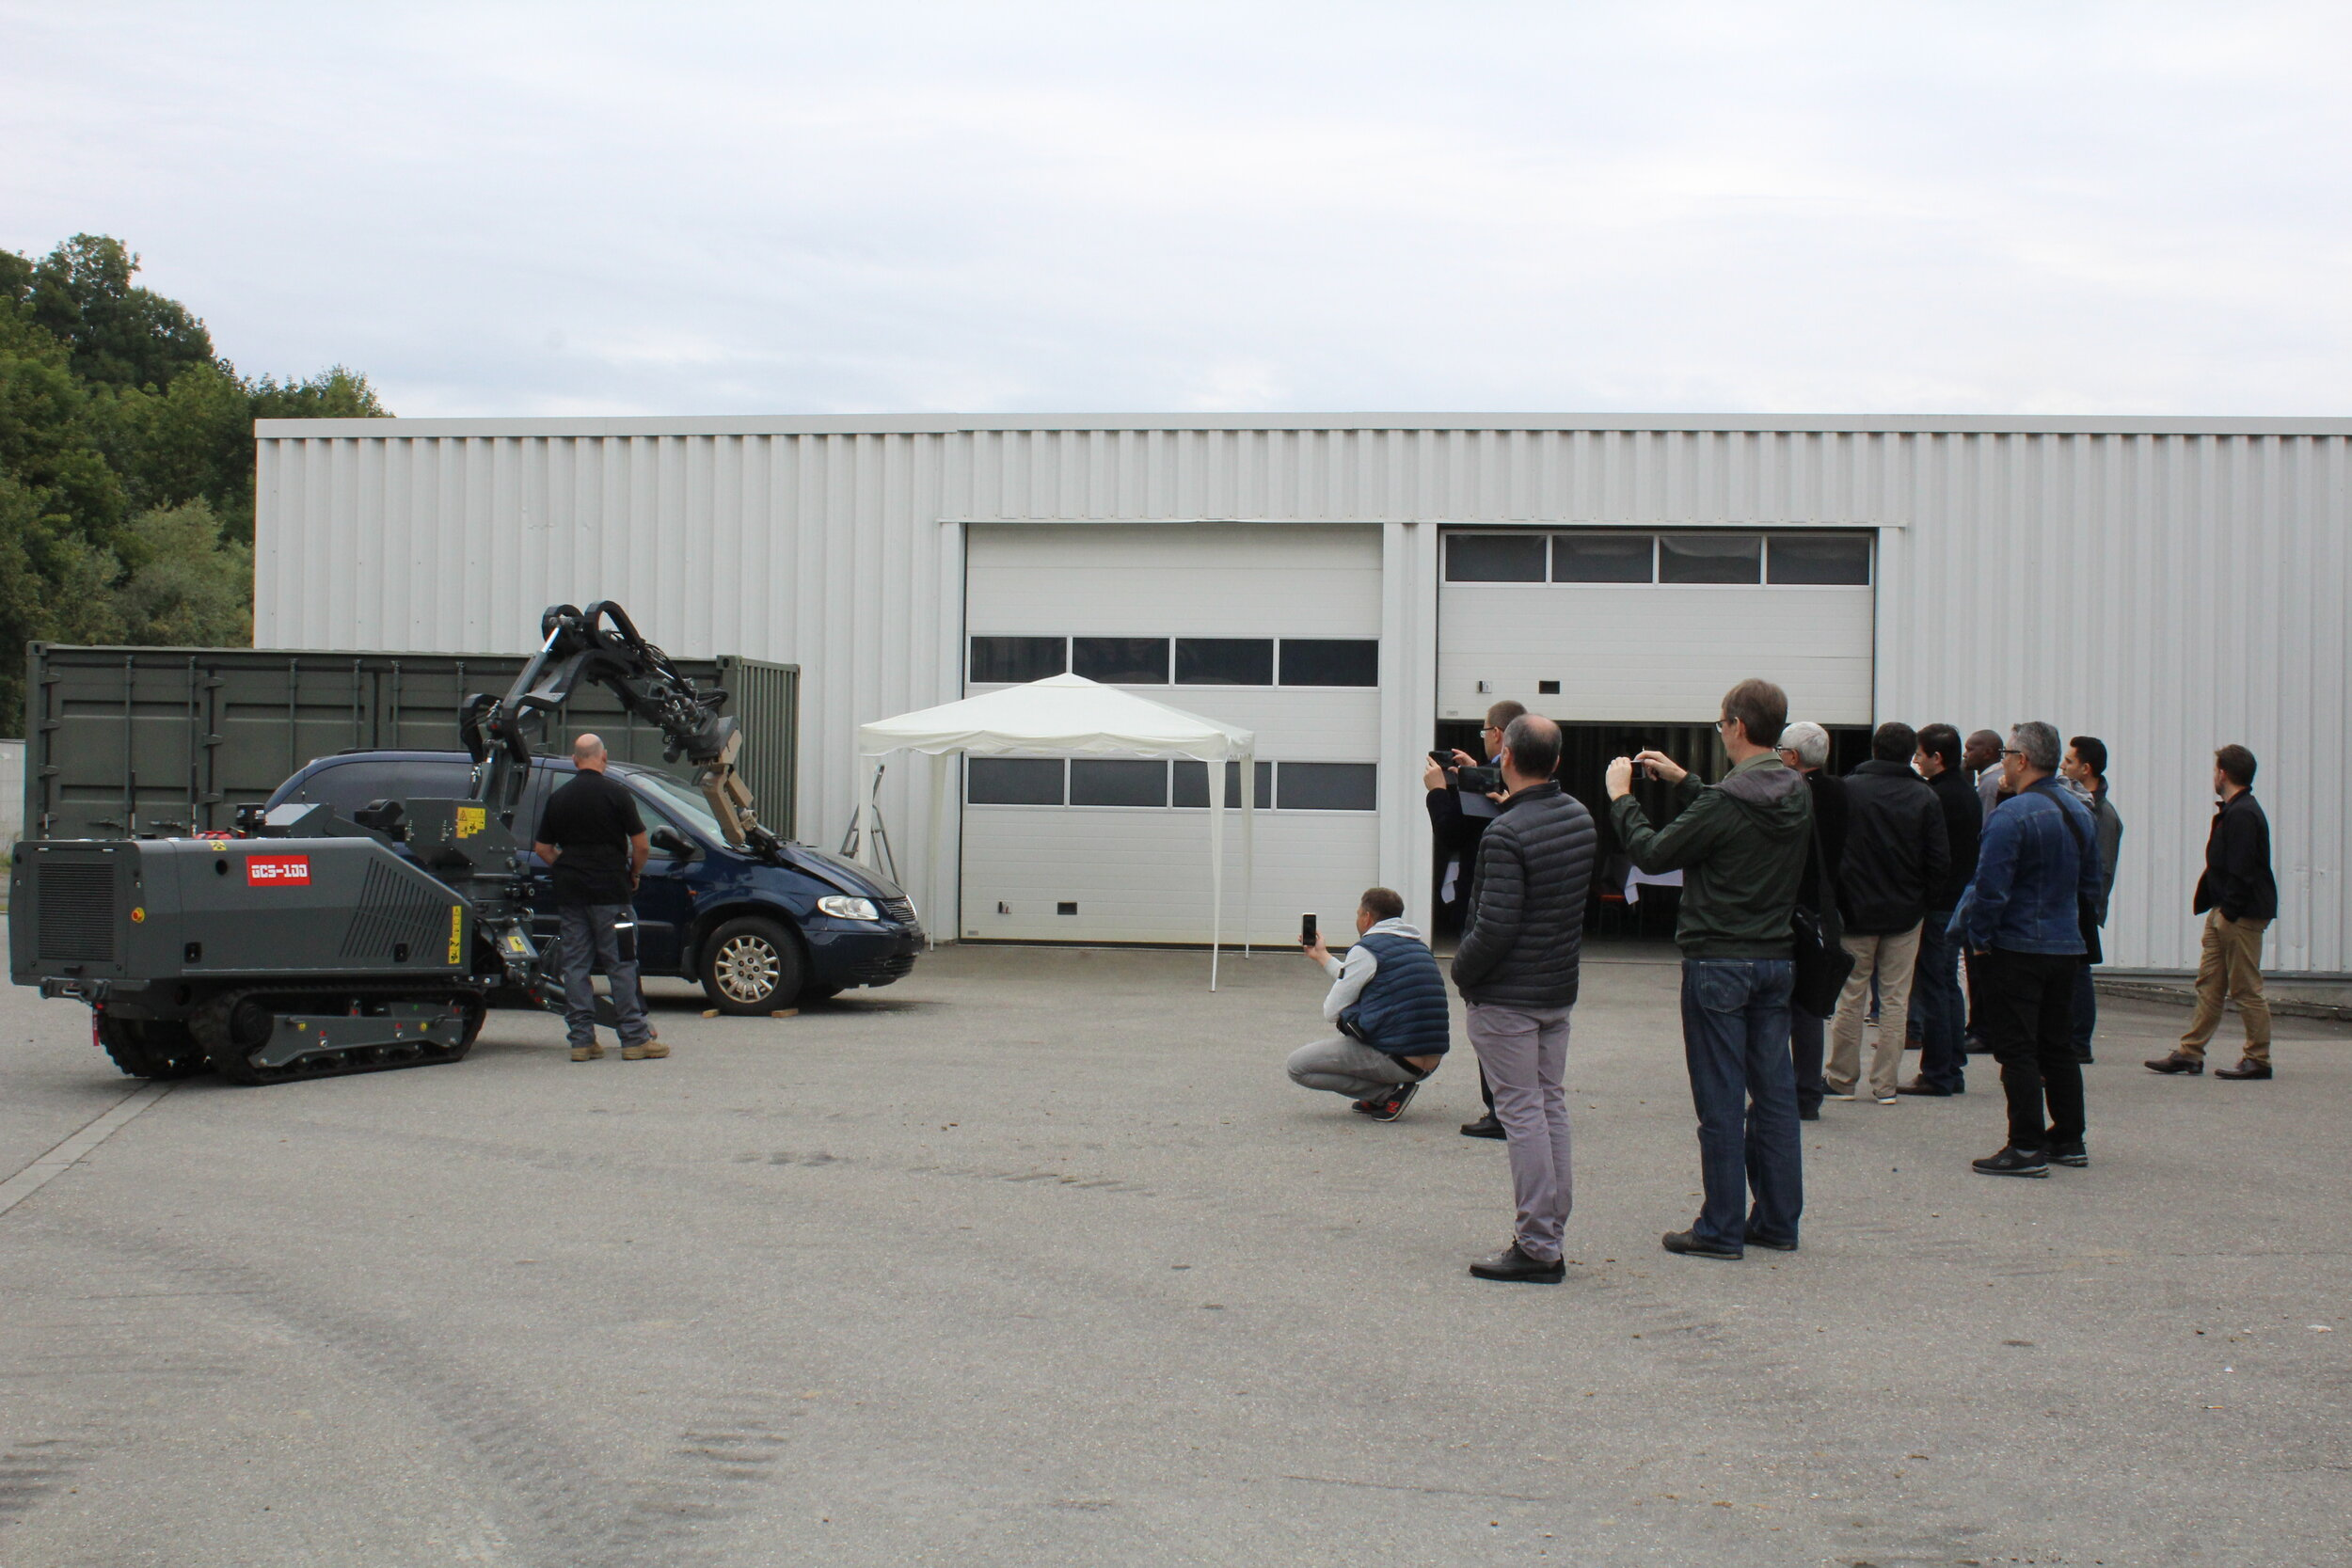 Senior Field Technician Chris Thompson demonstrates the GCS-100 in a vehicle-borne IED scenario